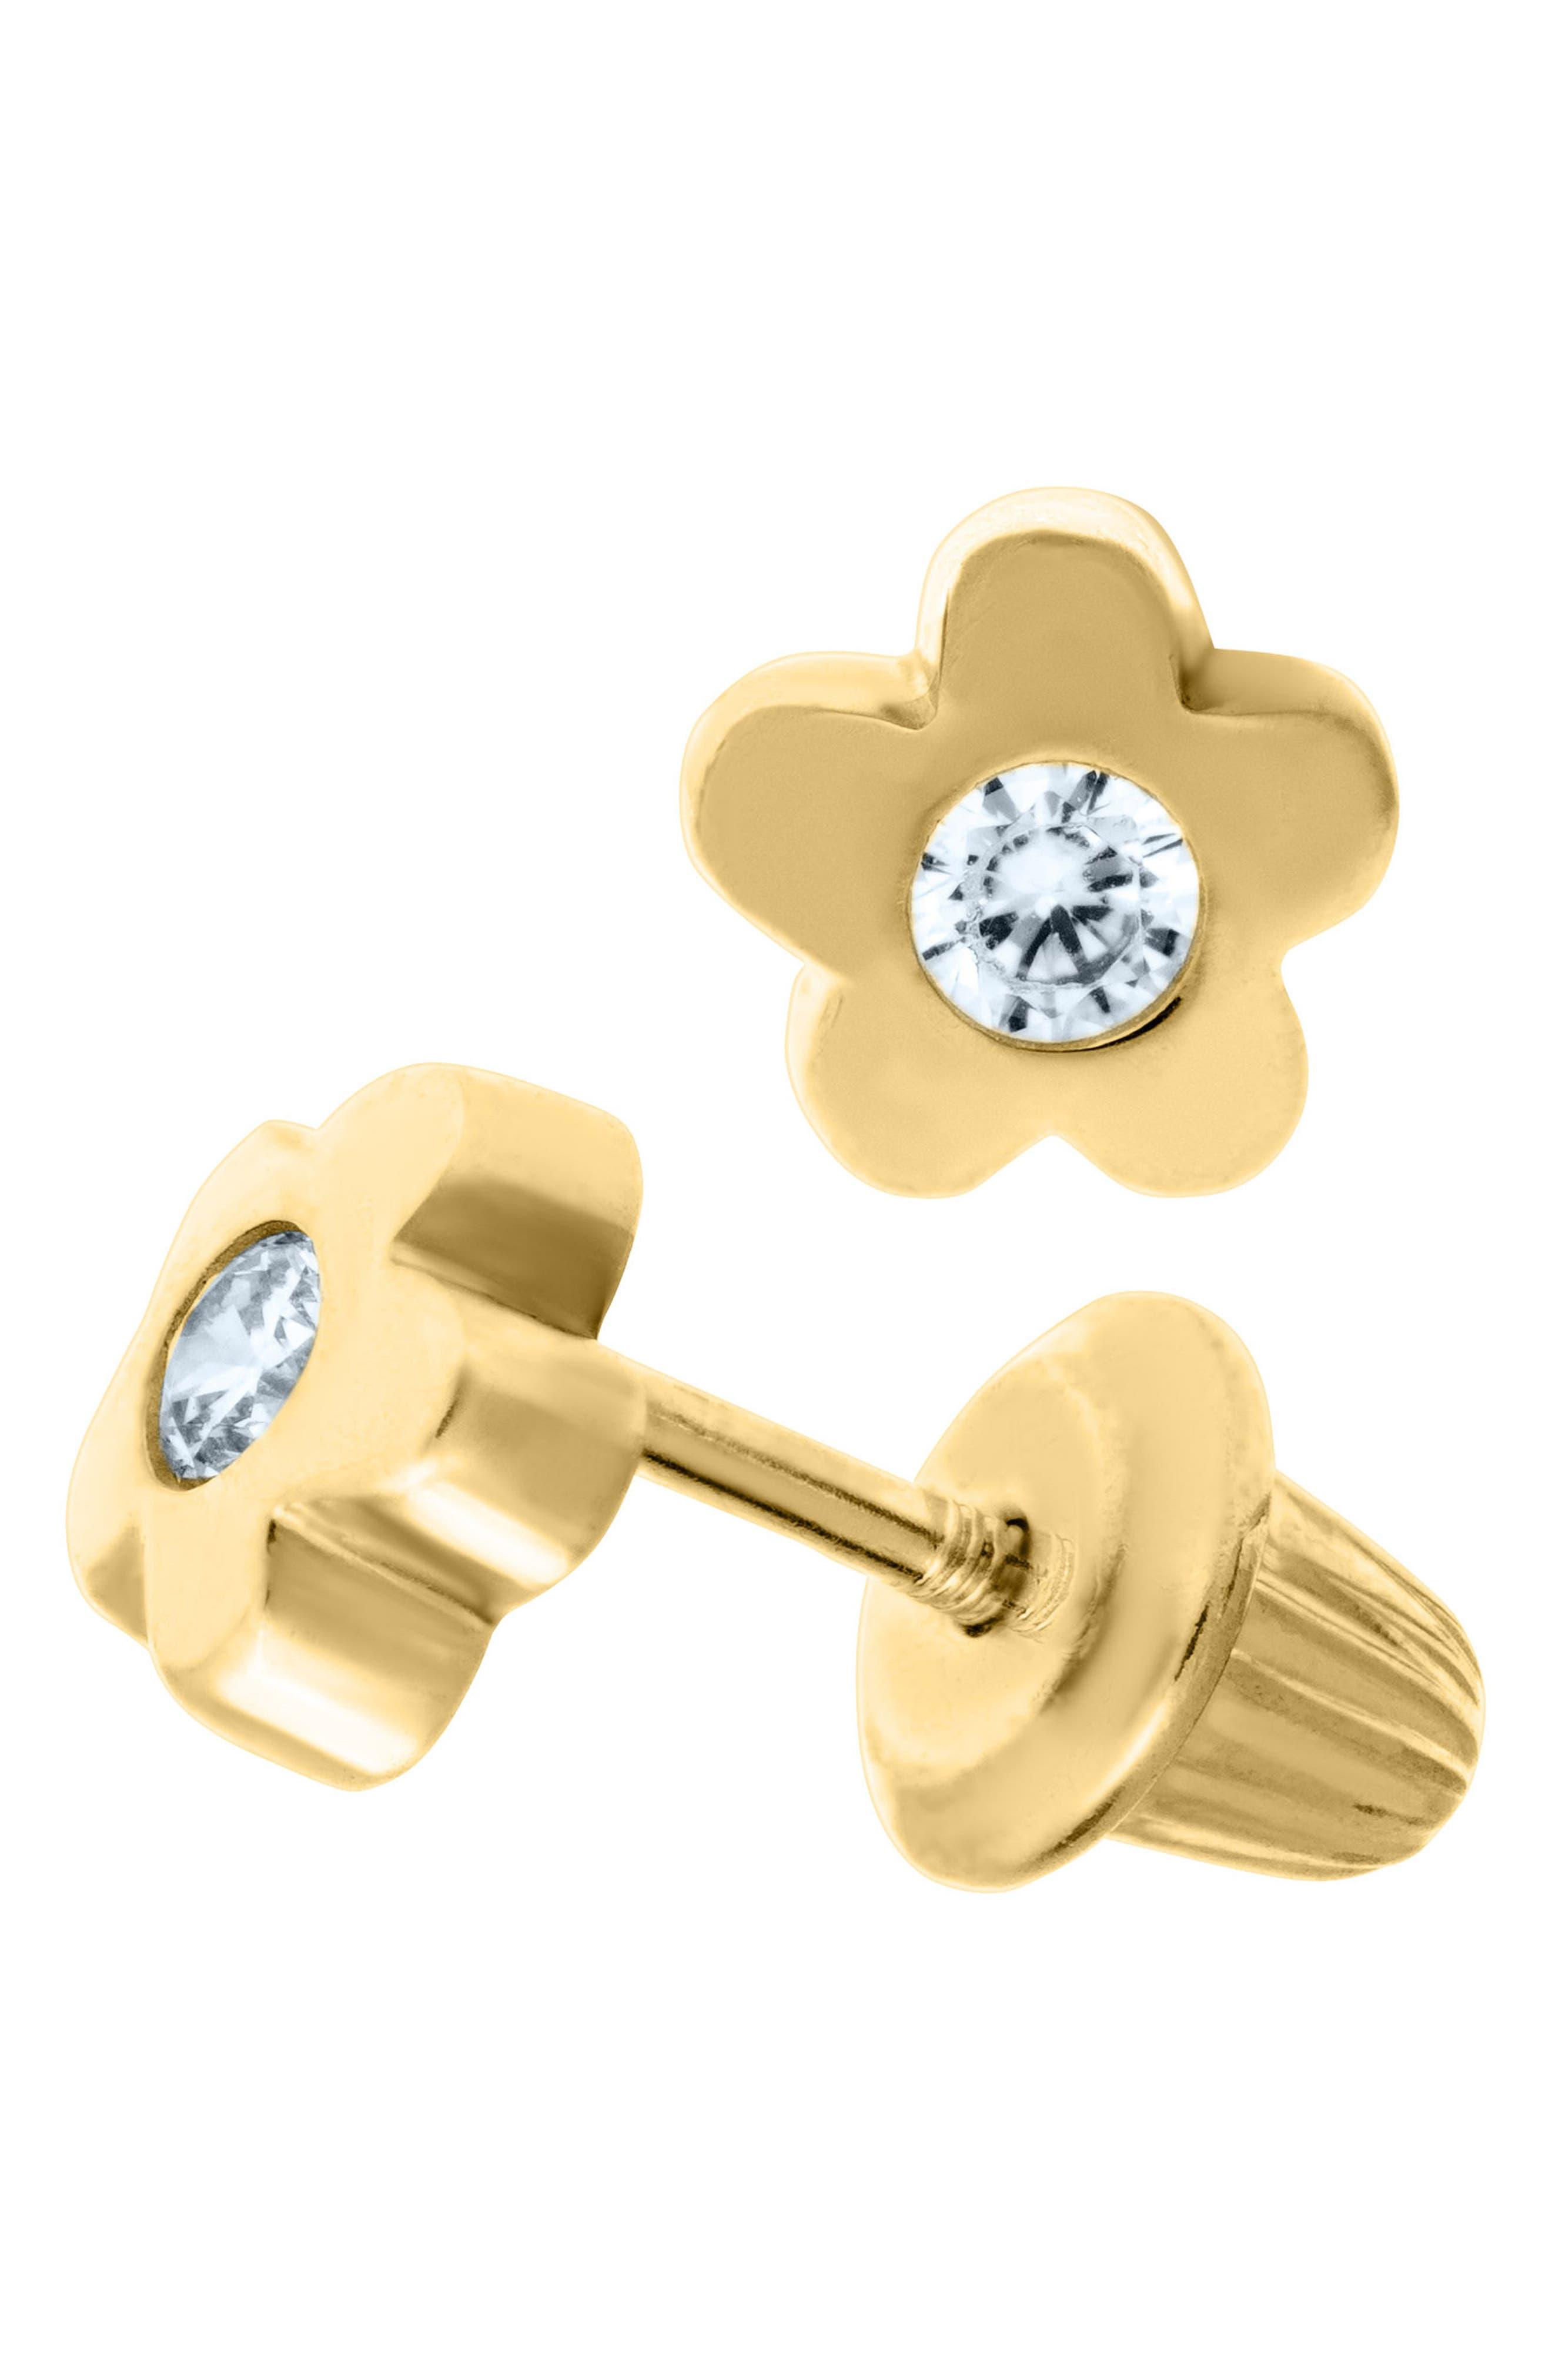 14k Gold & Cubic Zirconia Flower Earrings,                             Alternate thumbnail 2, color,                             GOLD